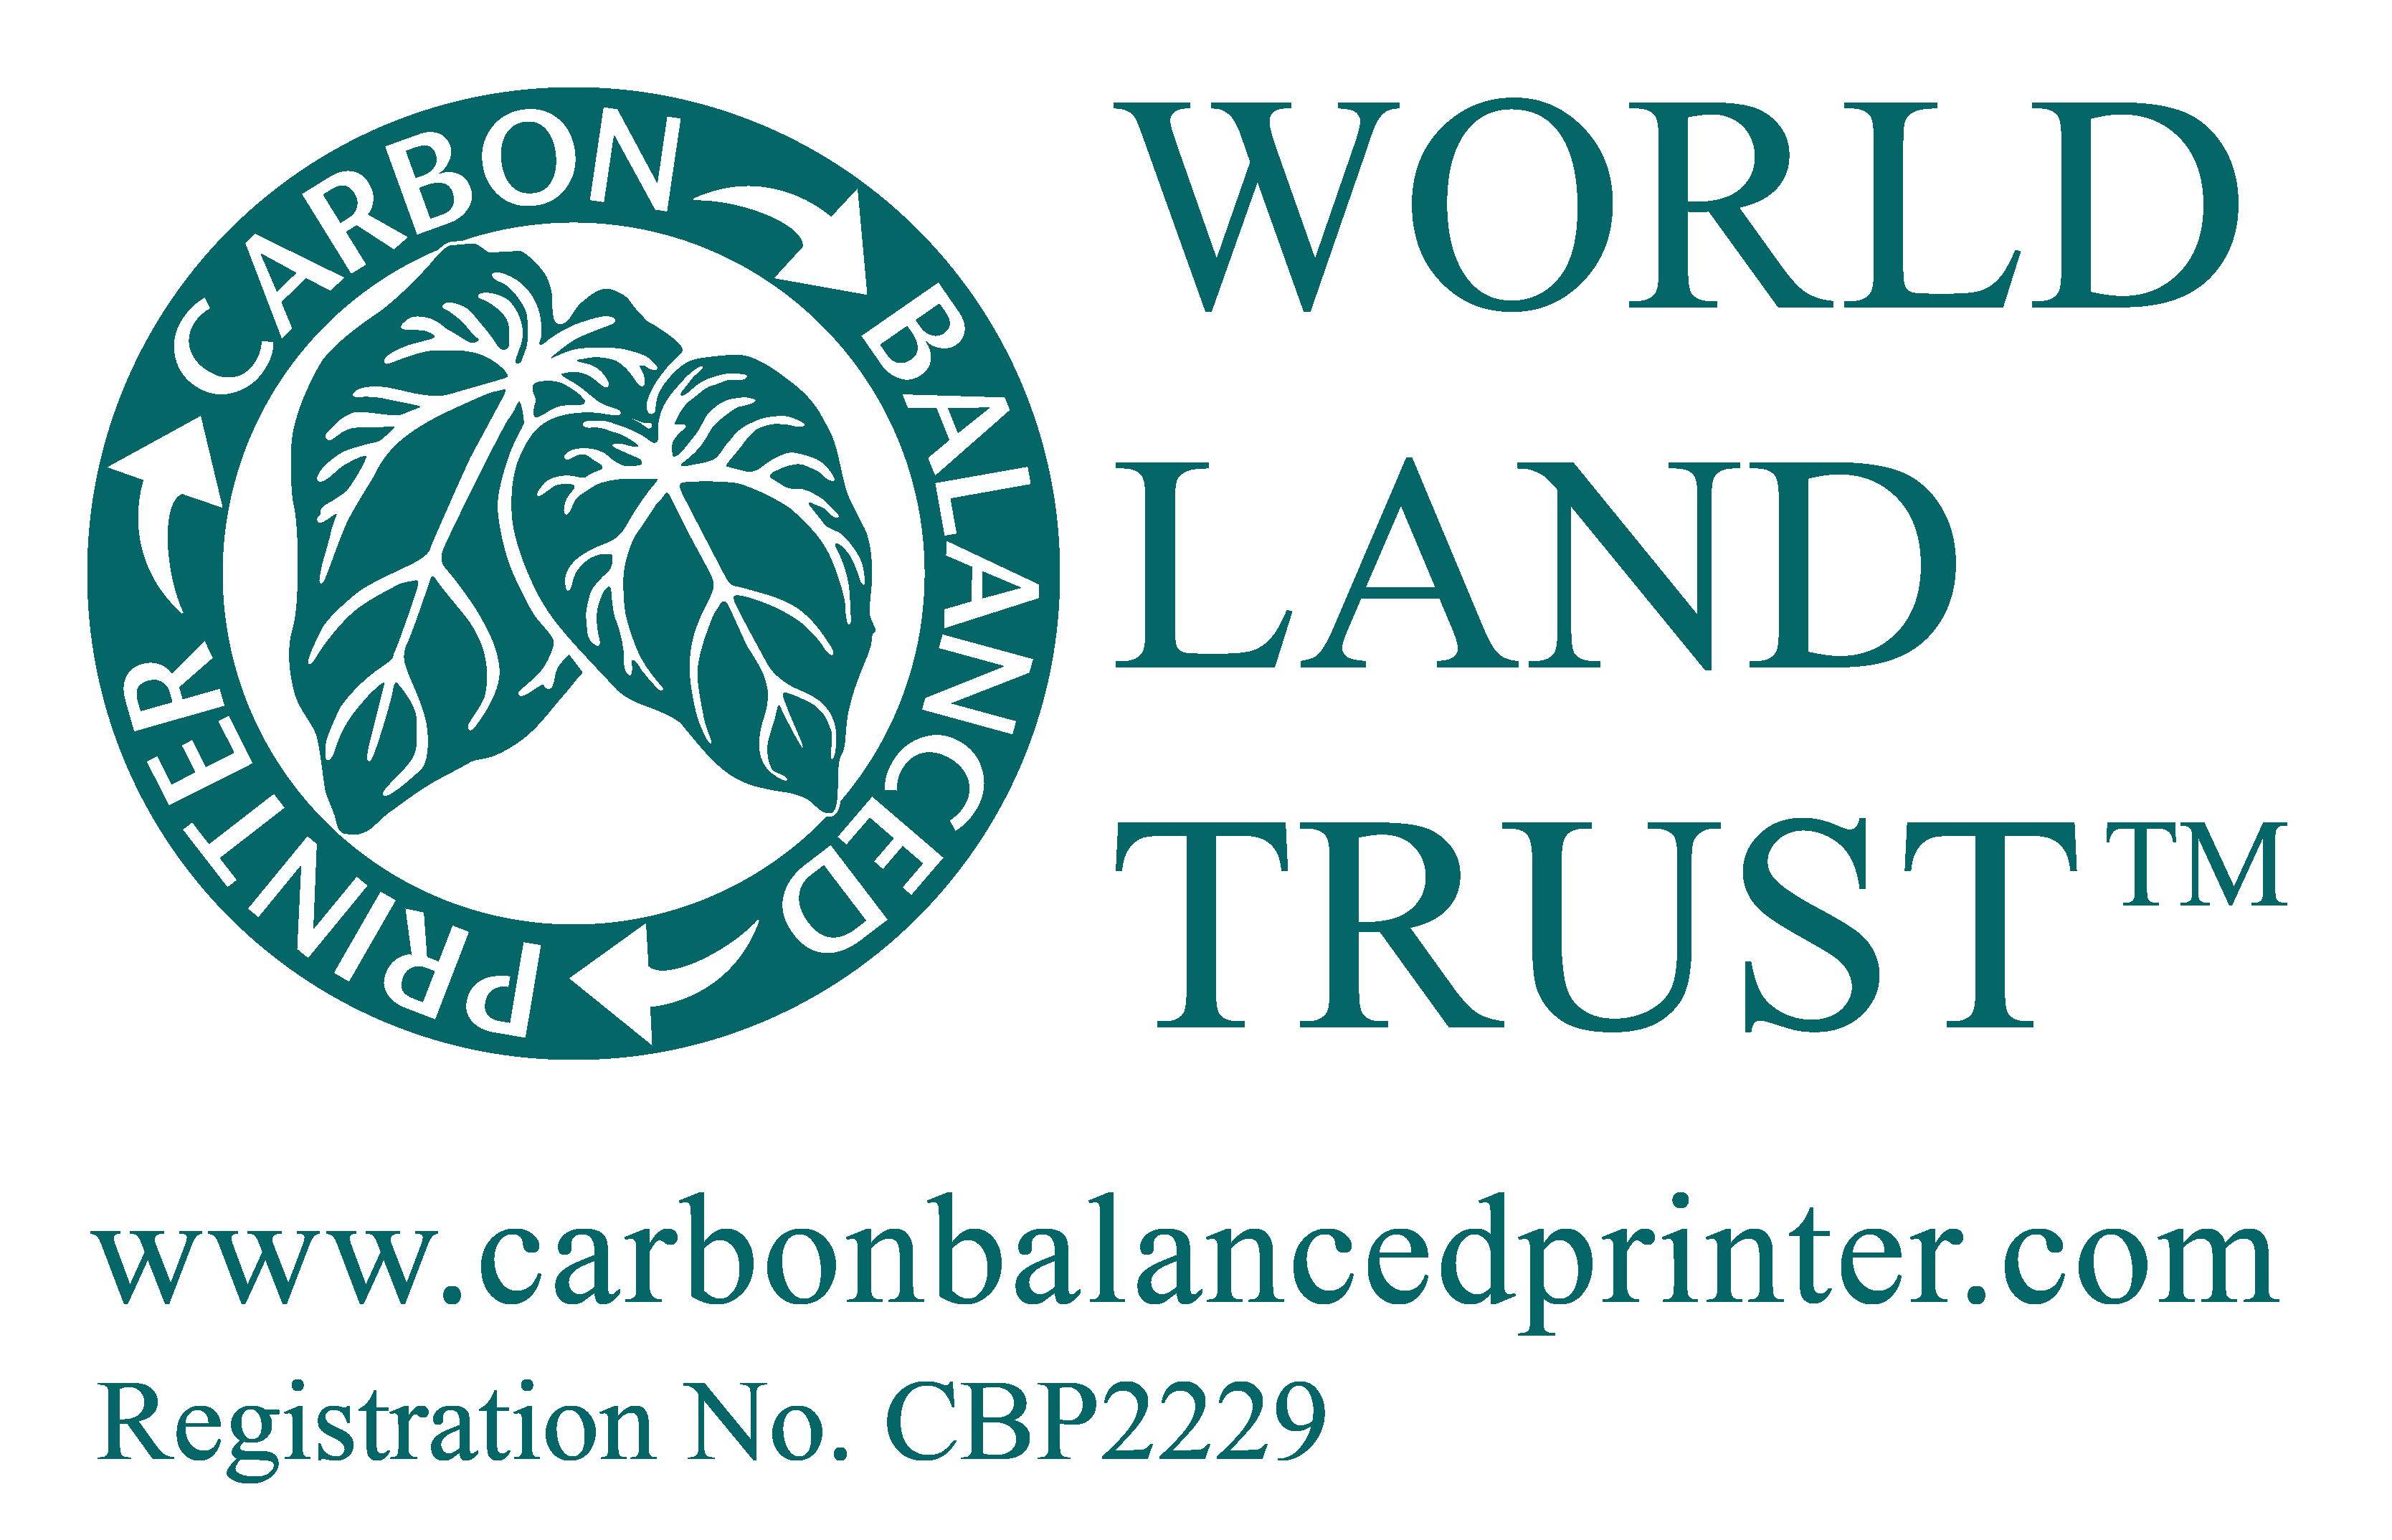 Carbon Balanced Printer